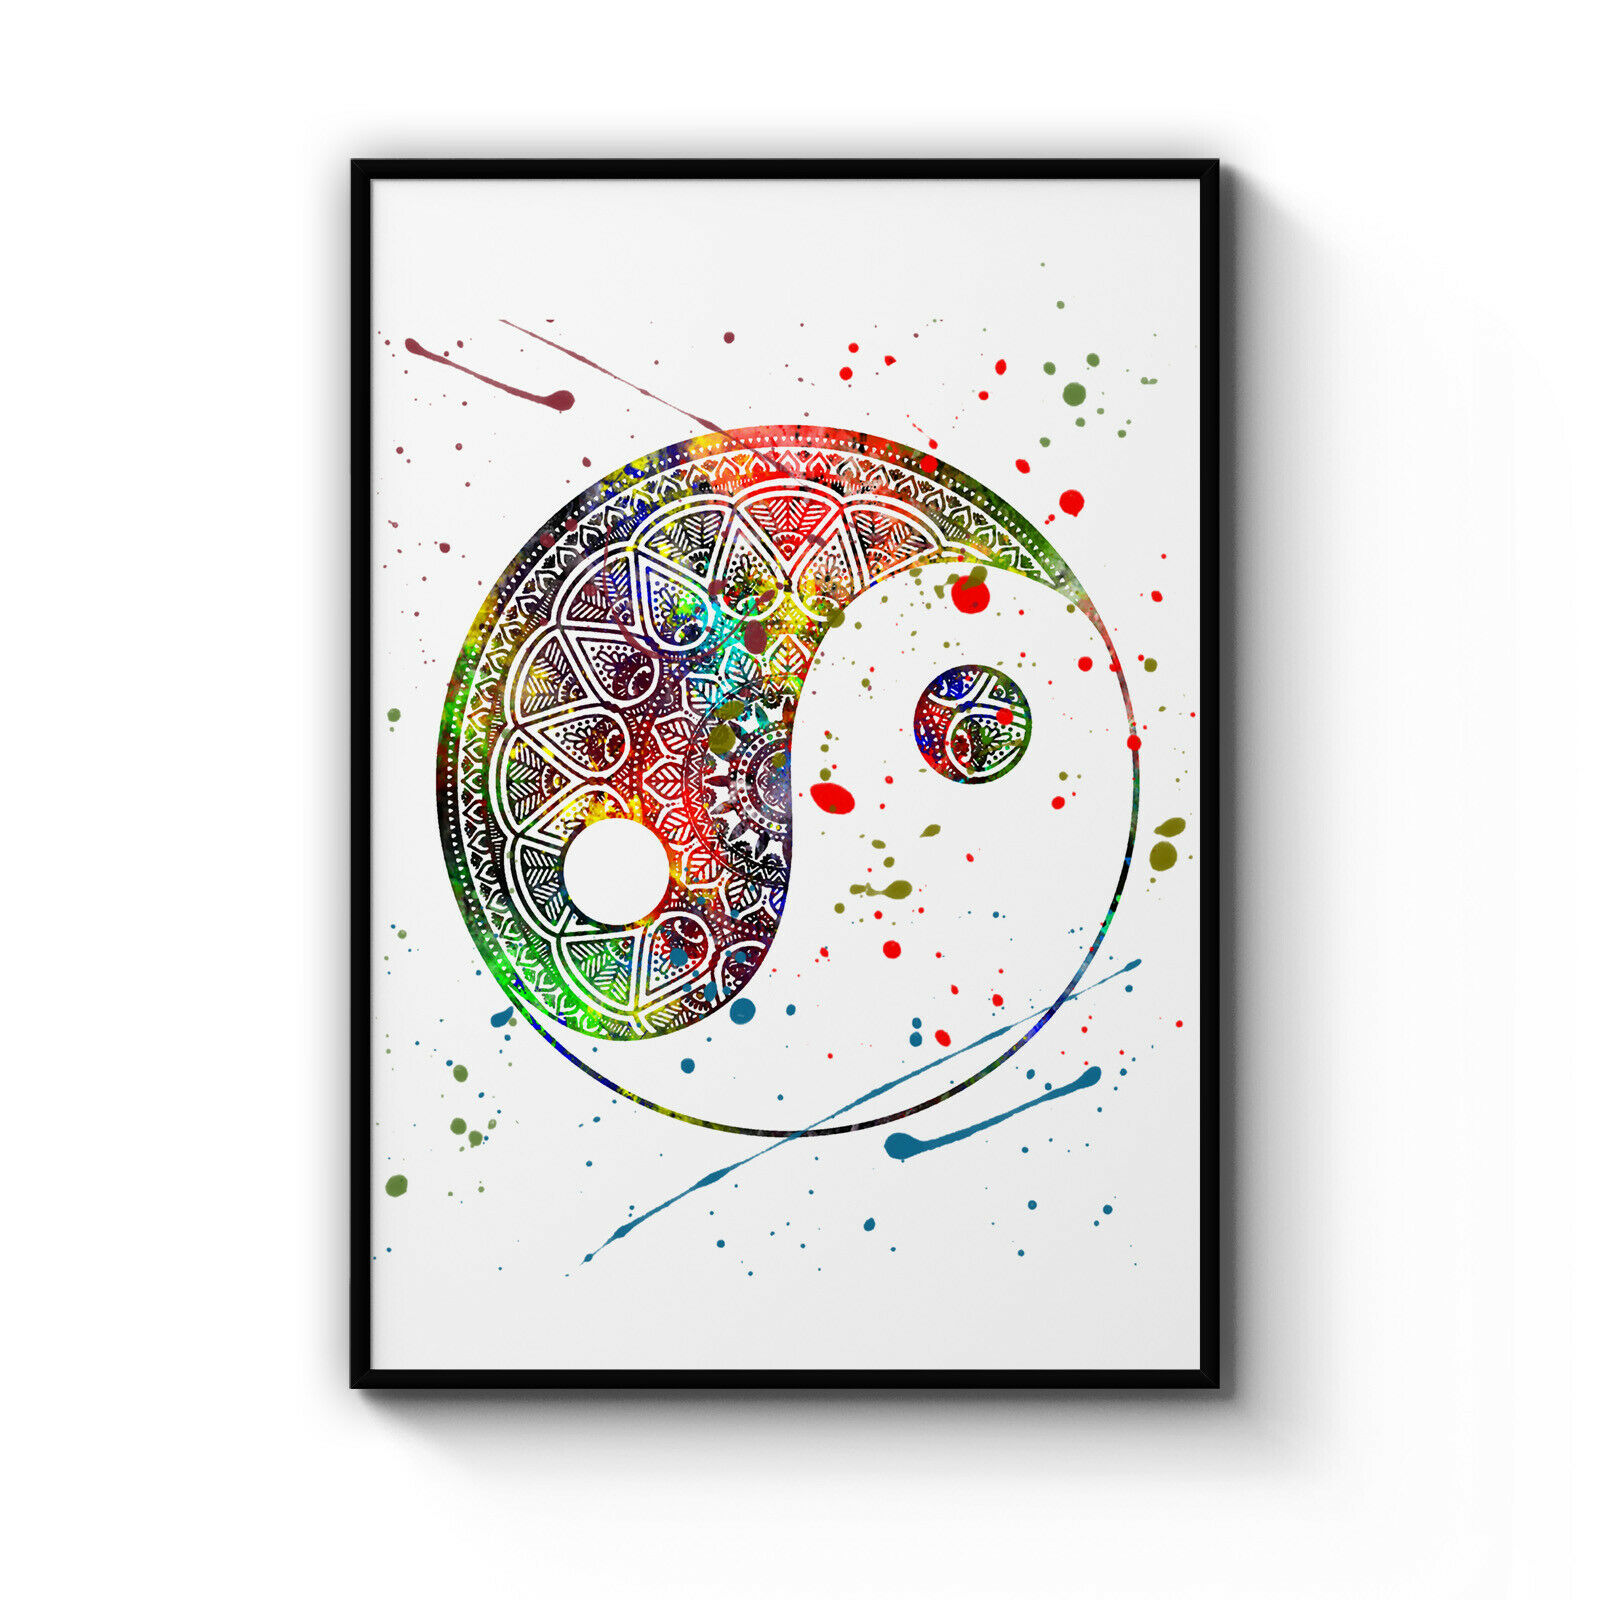 Yin Yang Mandala Pattern Yoga Buddhist Decor Poster Wall Art Print Artwork Frame